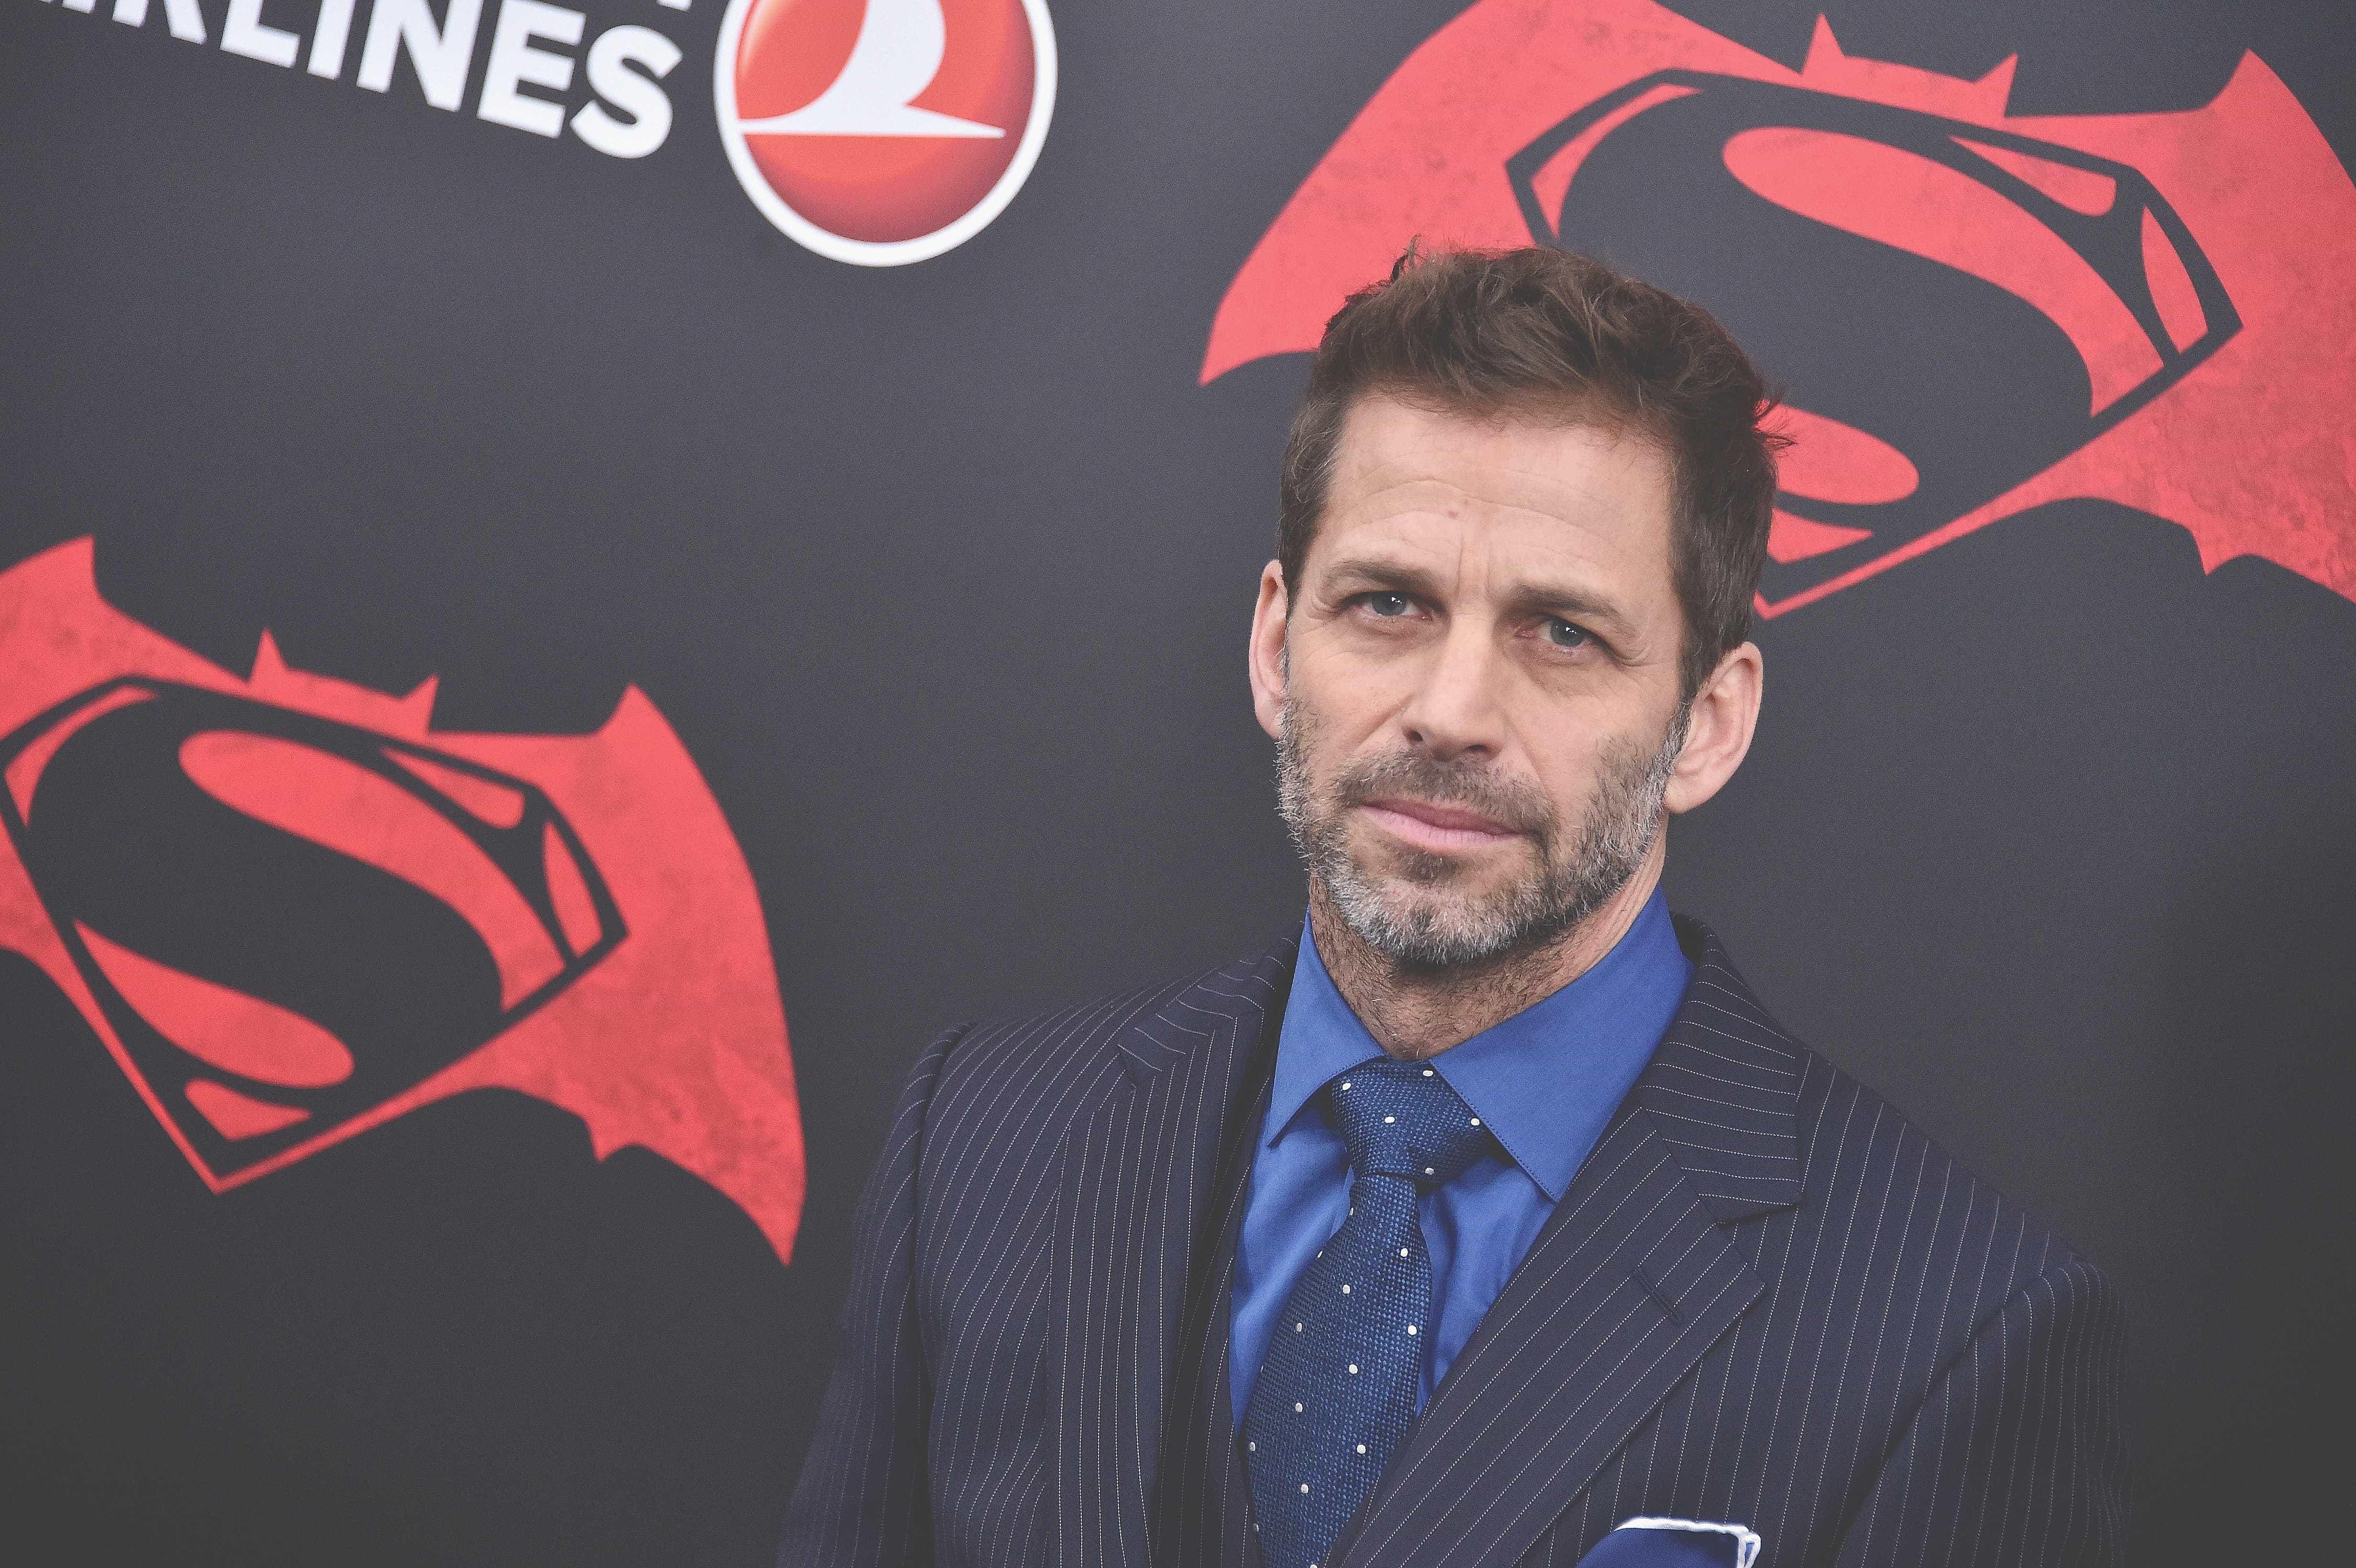 Zack Snyder regressa aos zombies e conta com wrestler como protagonista